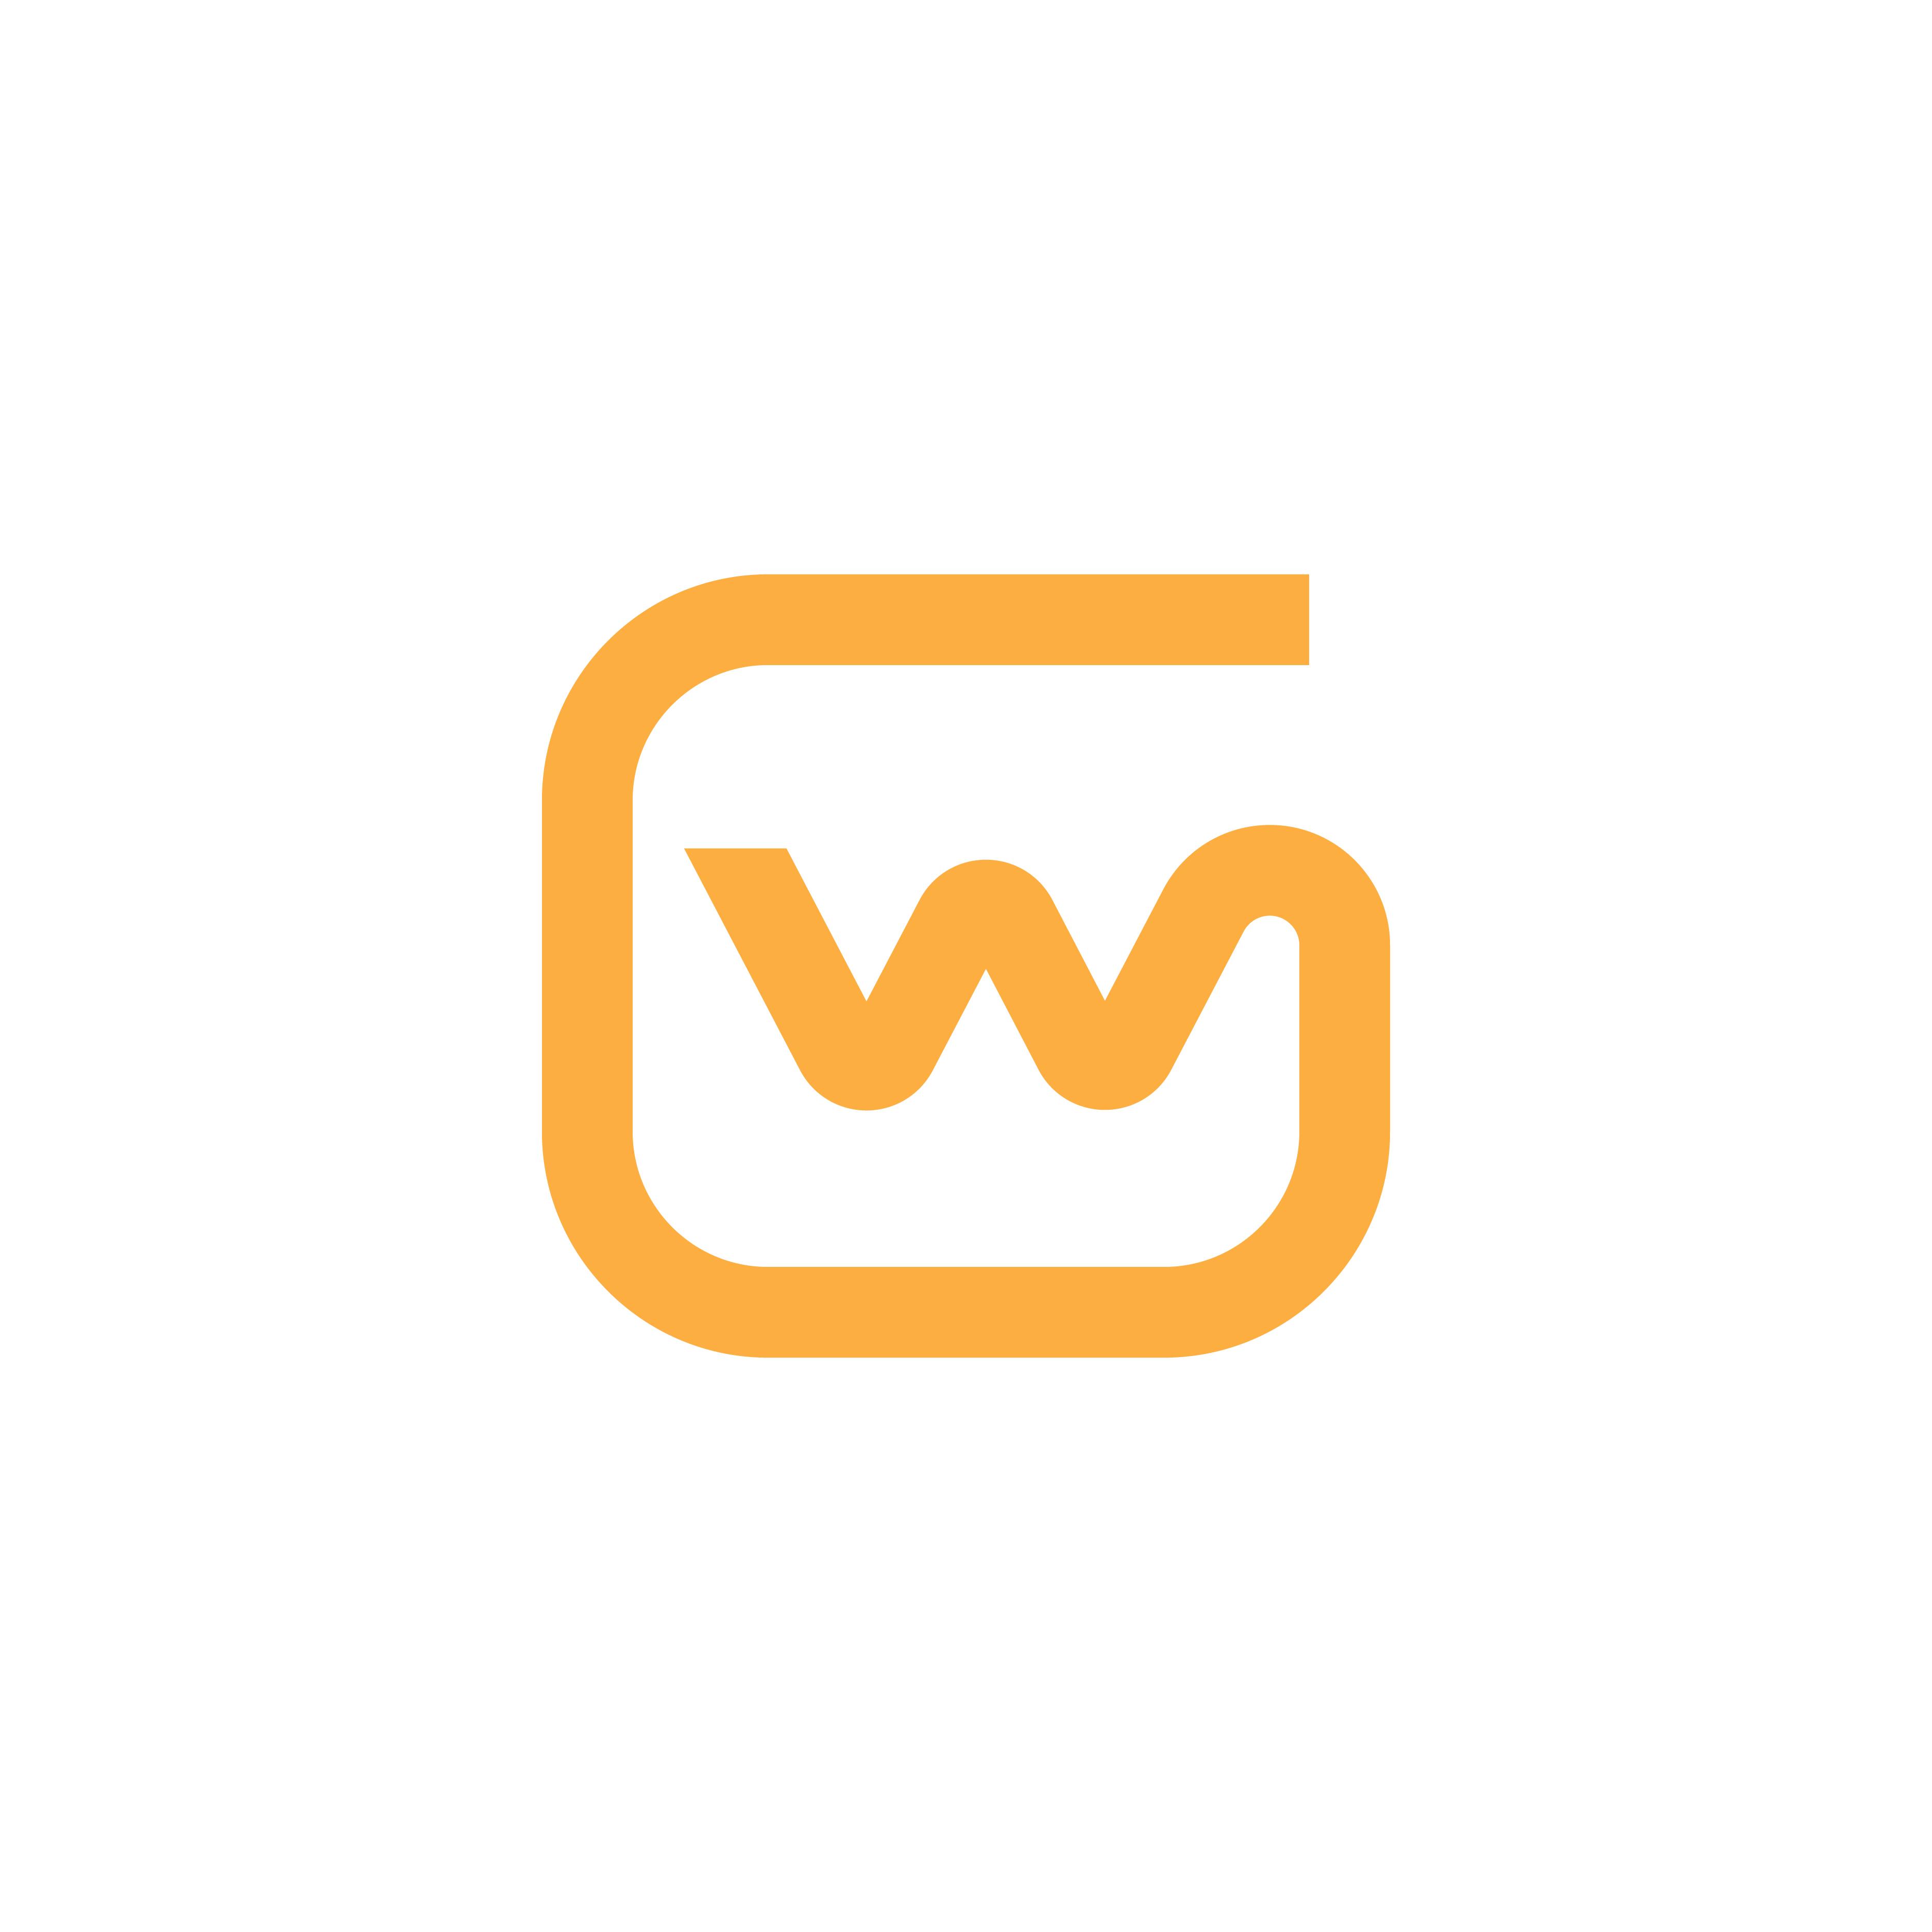 Wiseguy logo design by logo designer brandclay